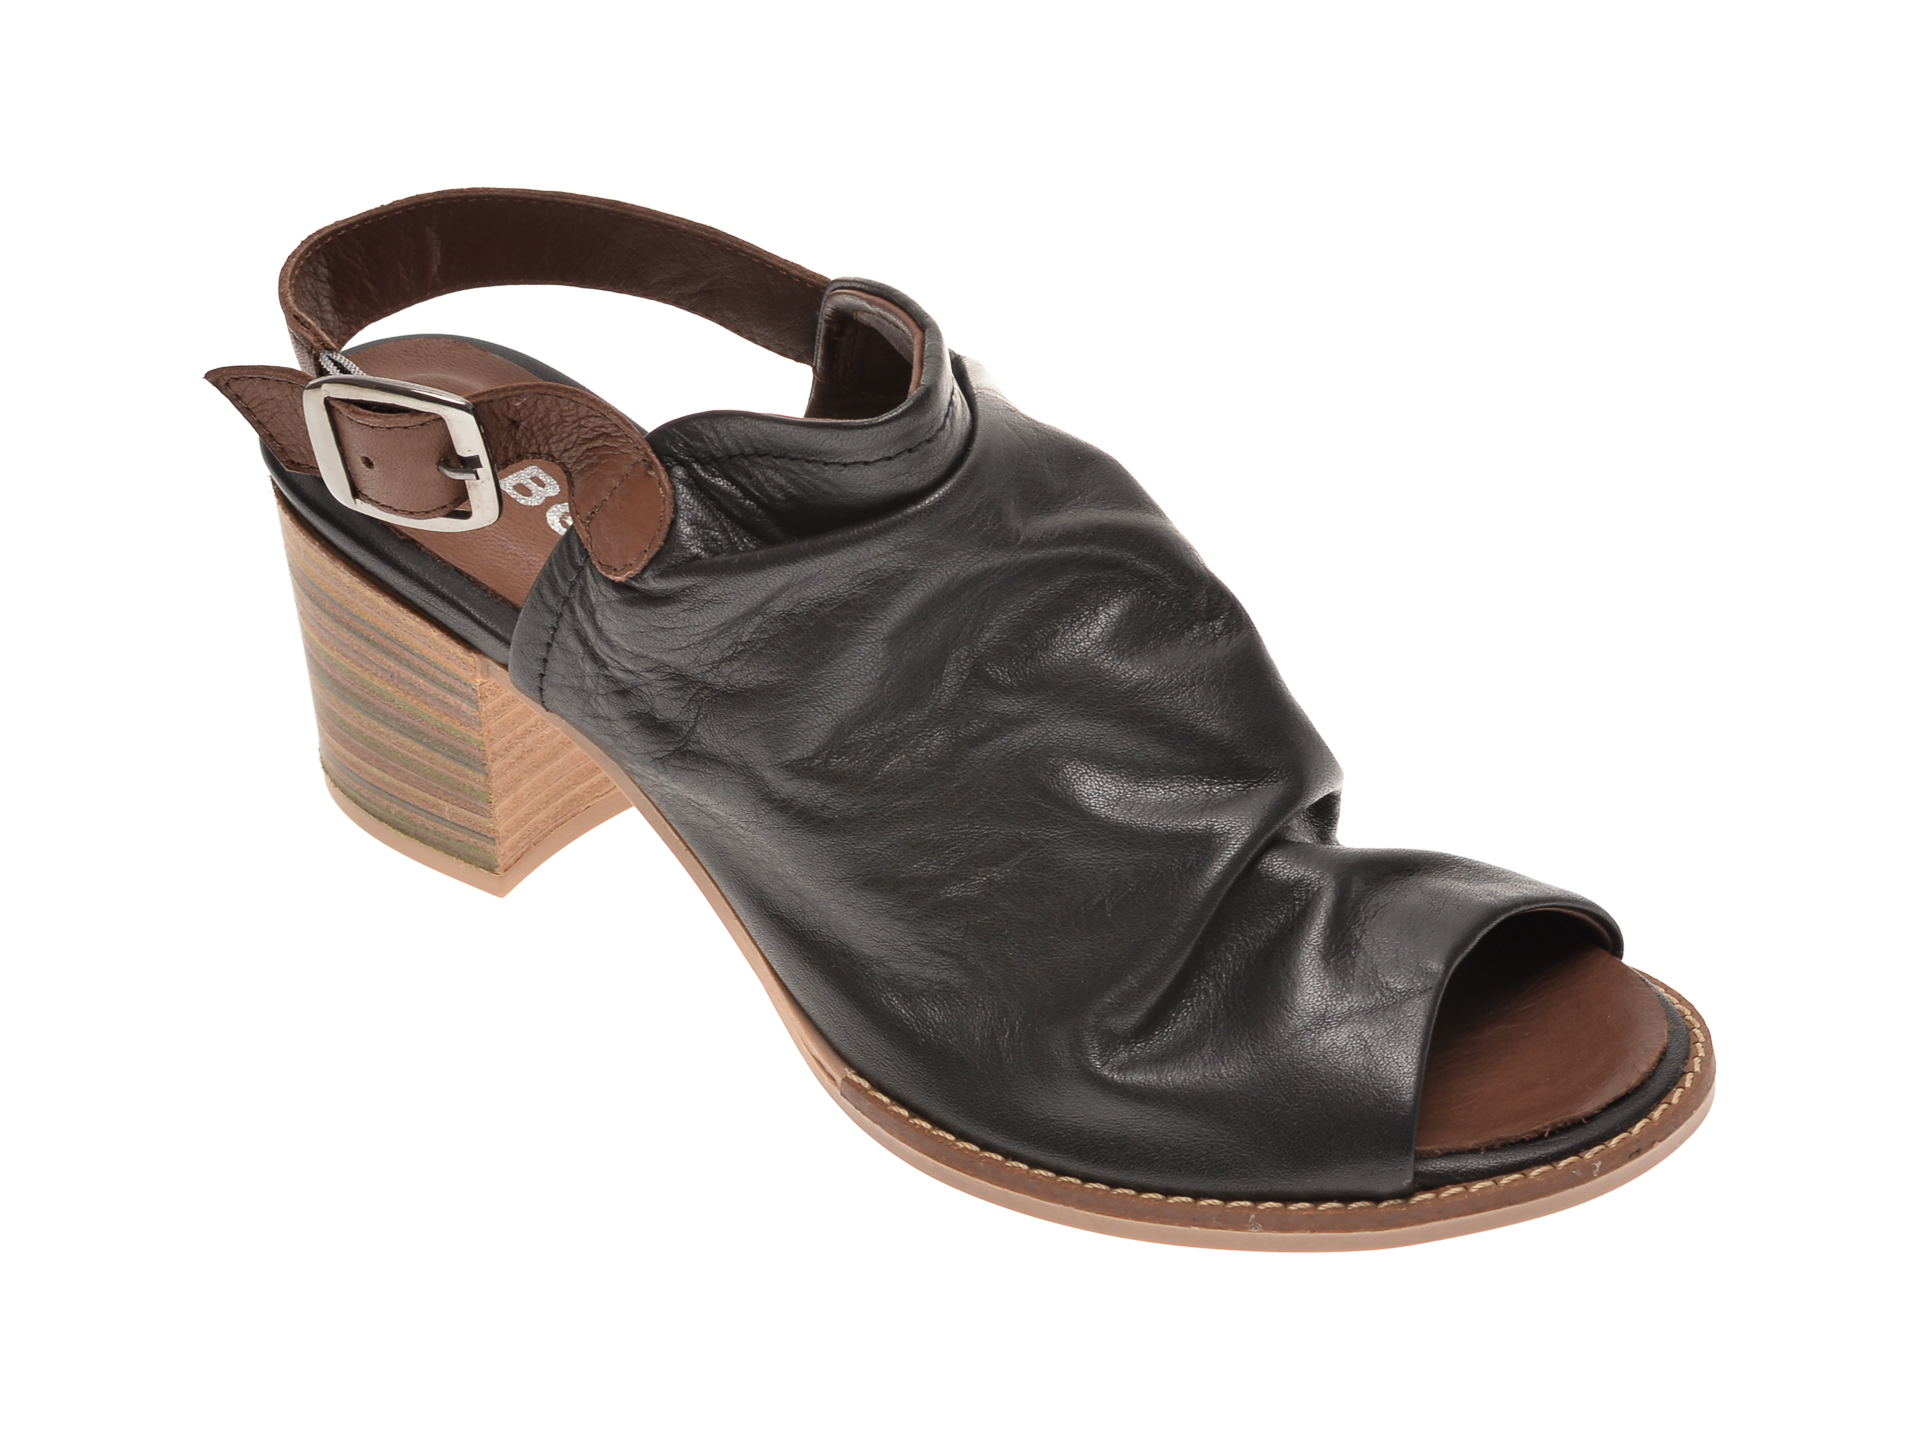 Sandale BABOOS negre, 1702, din piele naturala New